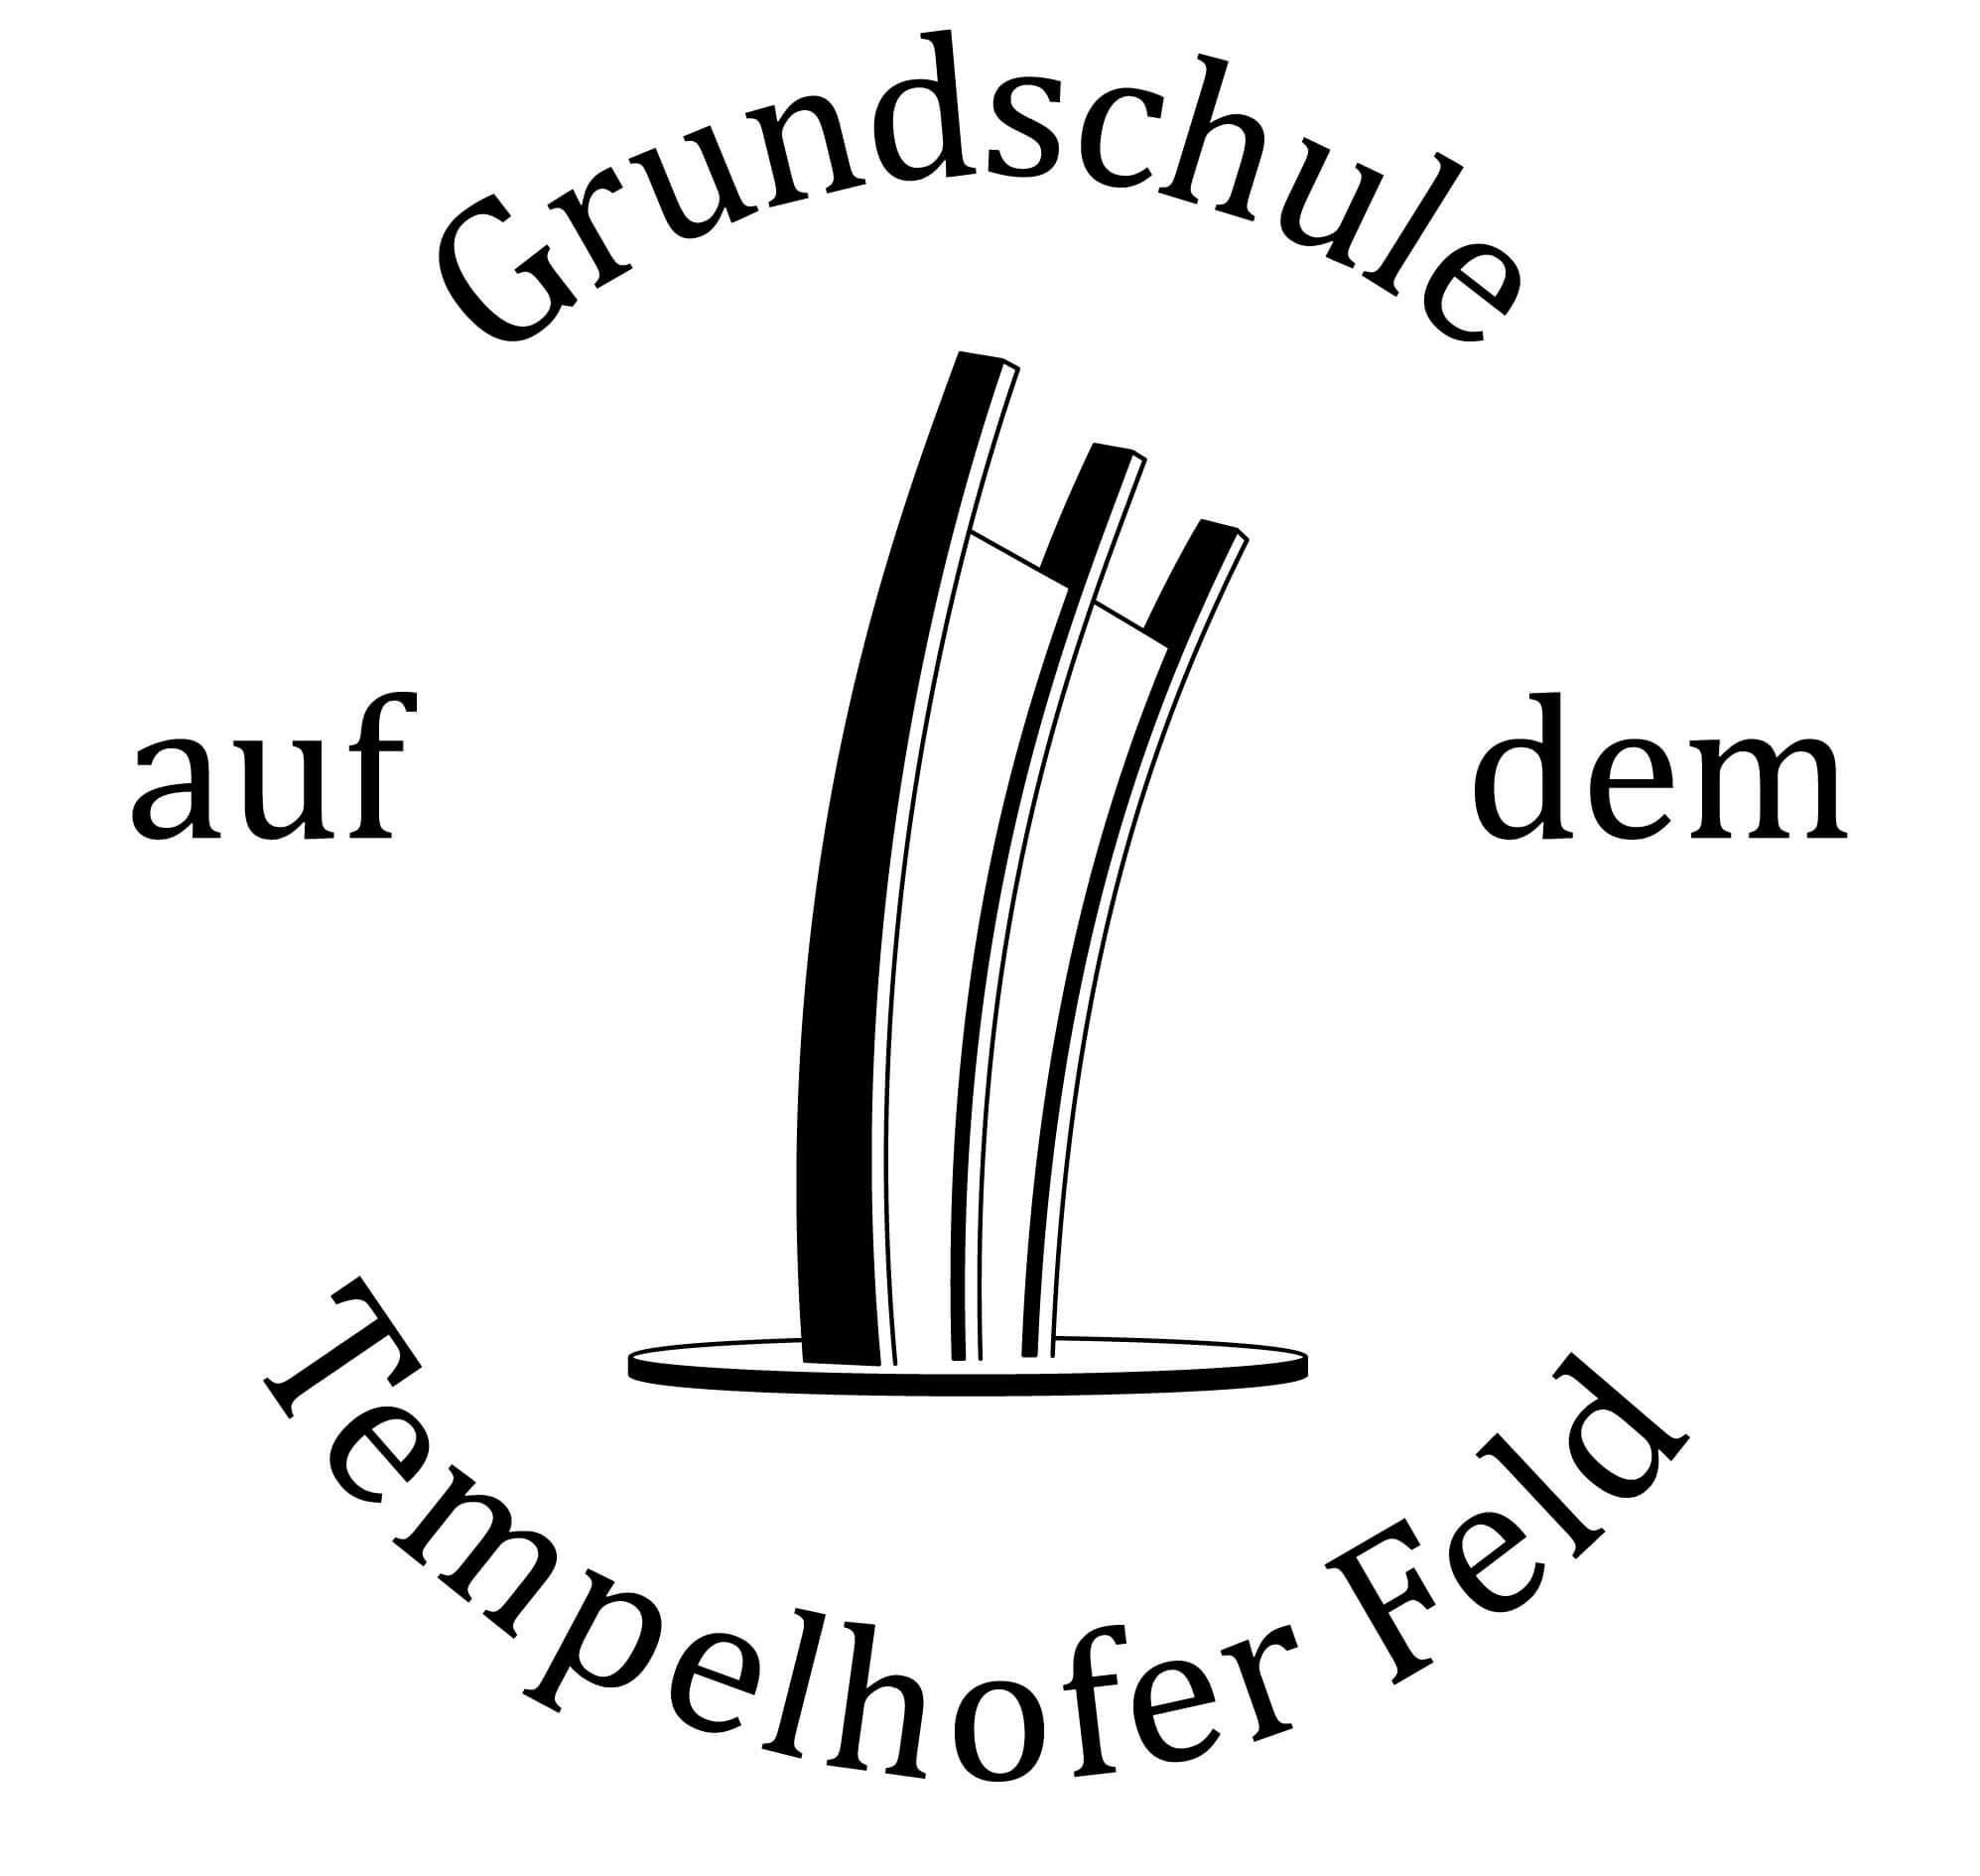 Logo der Grundschule auf dem Tempelhfoer Feld